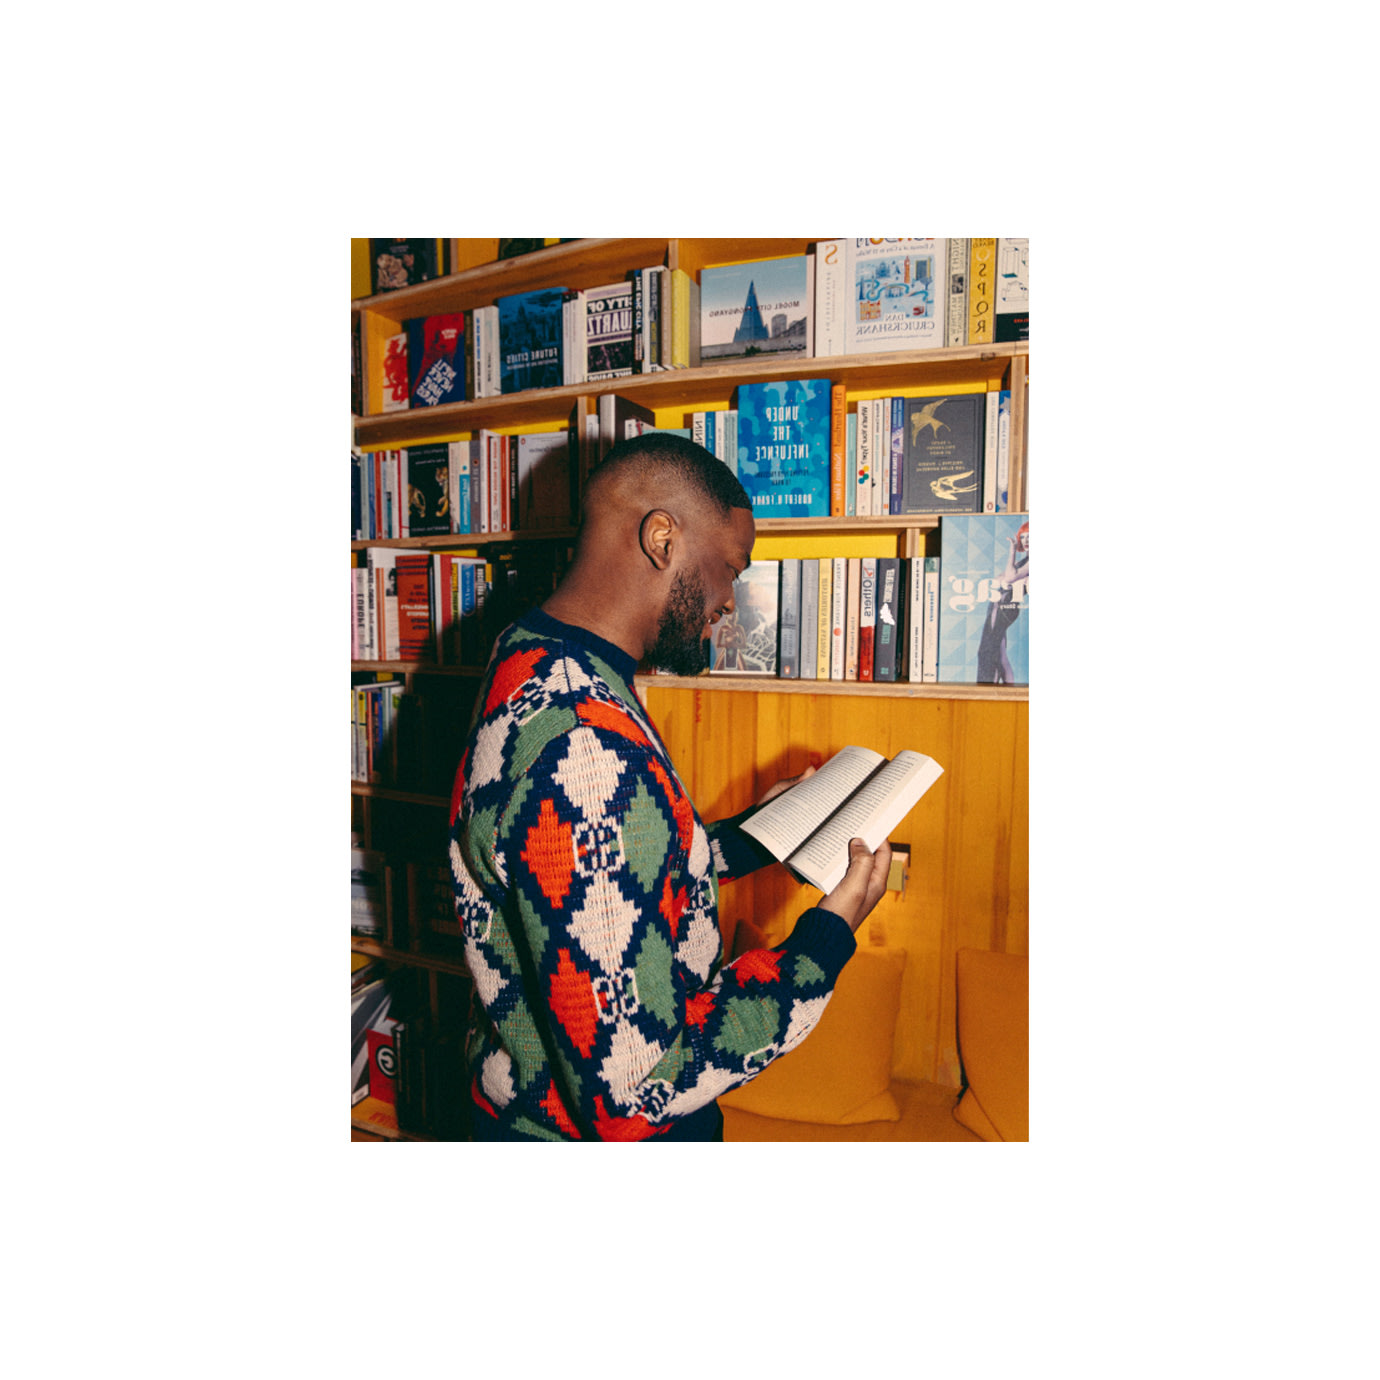 A man reading a book next to a yellow bookcase.